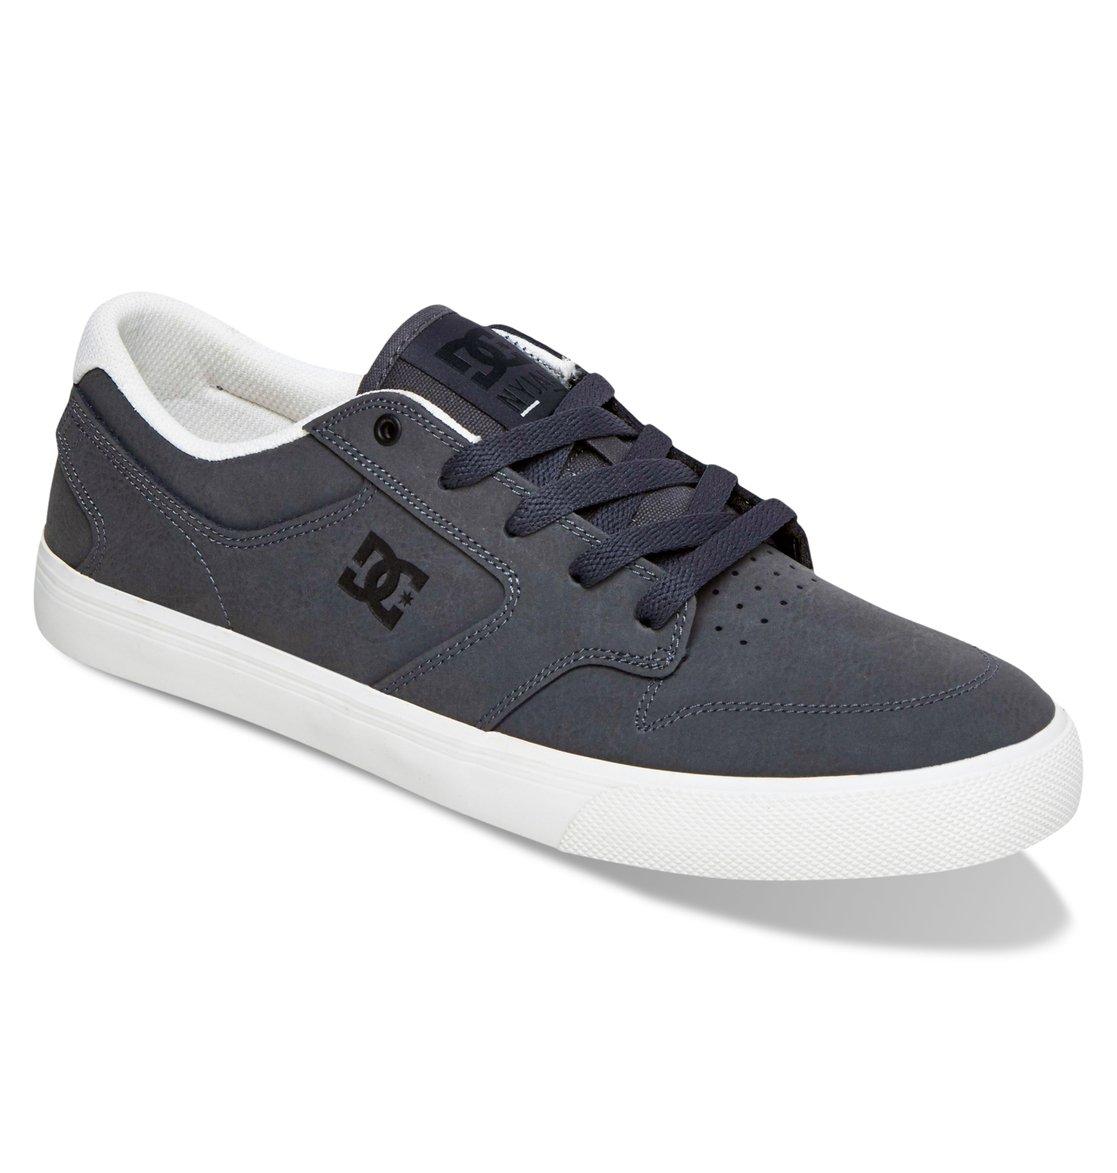 Dc Shoes Nyjah S